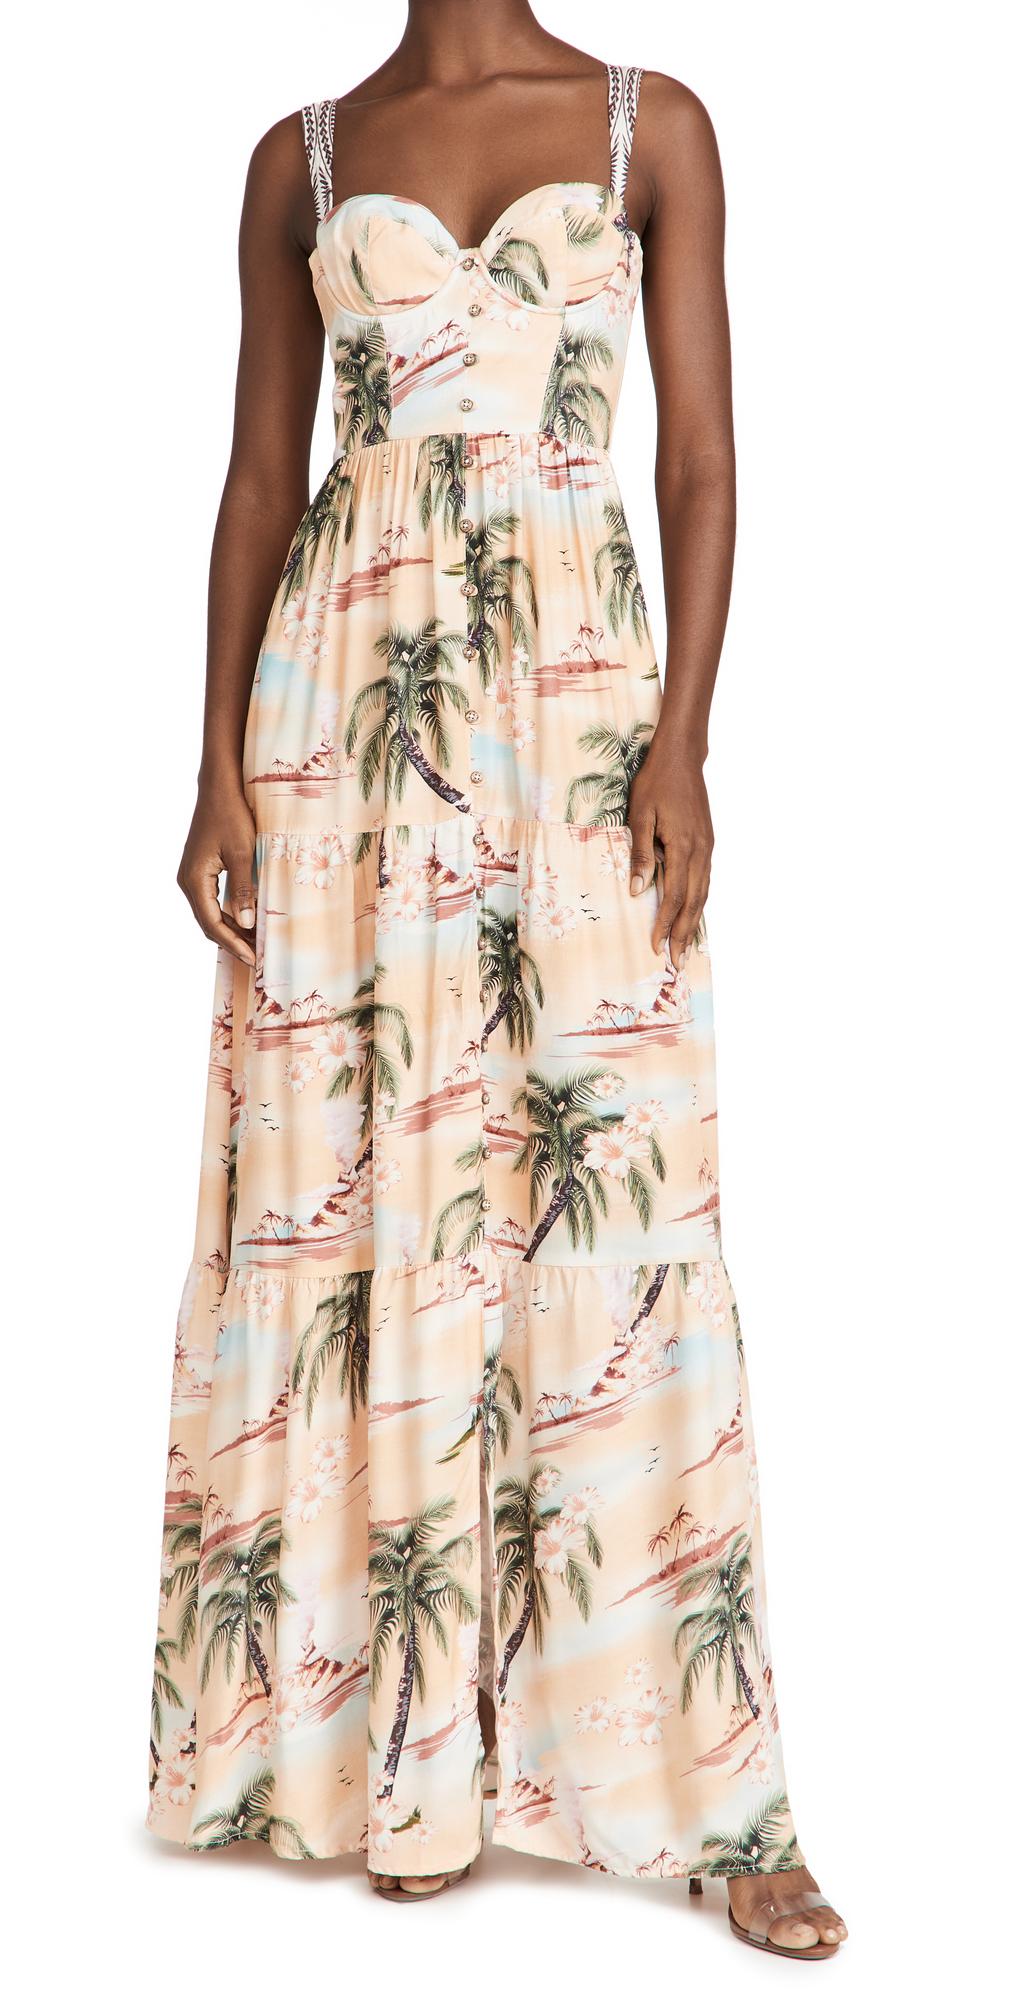 Dunna Luau Dress